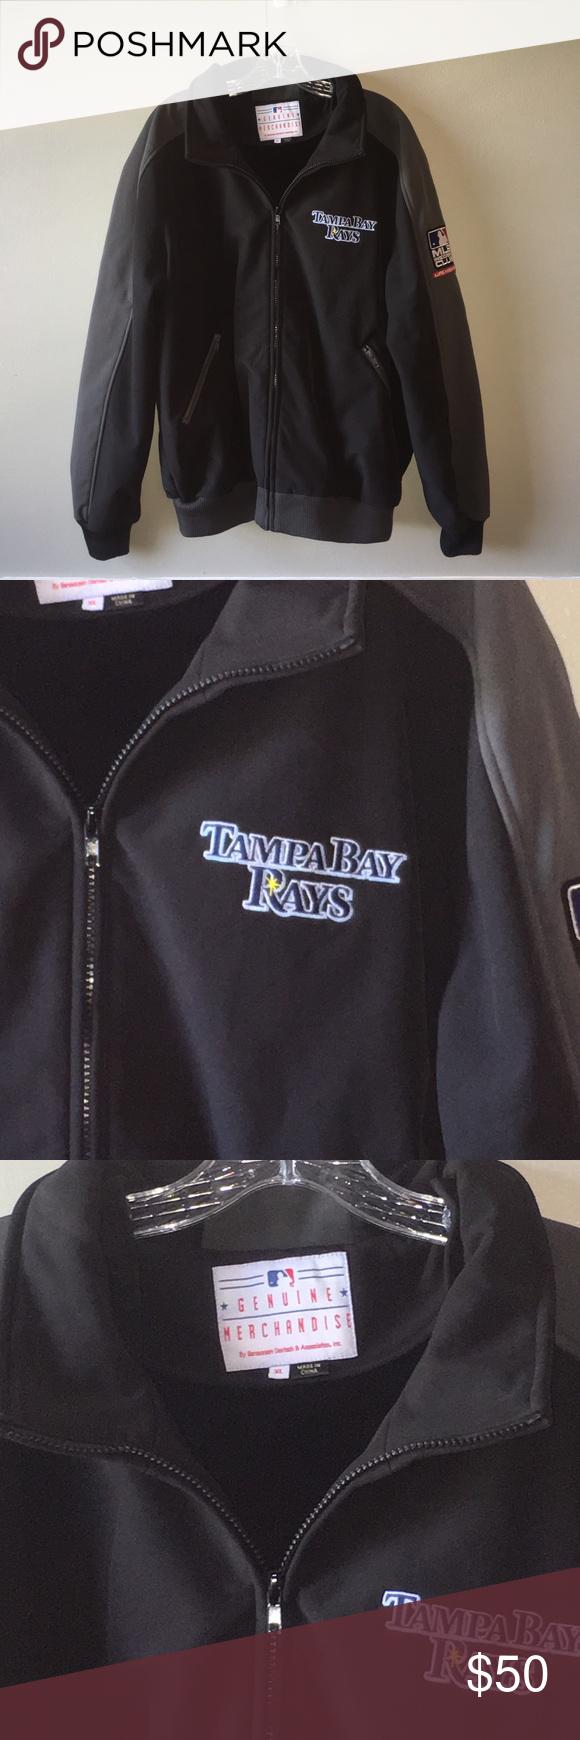 Tampa Bay Rays Coat Jacket Mlb Insiders Club Xl Coats Jackets Tampa Bay Rays Jackets